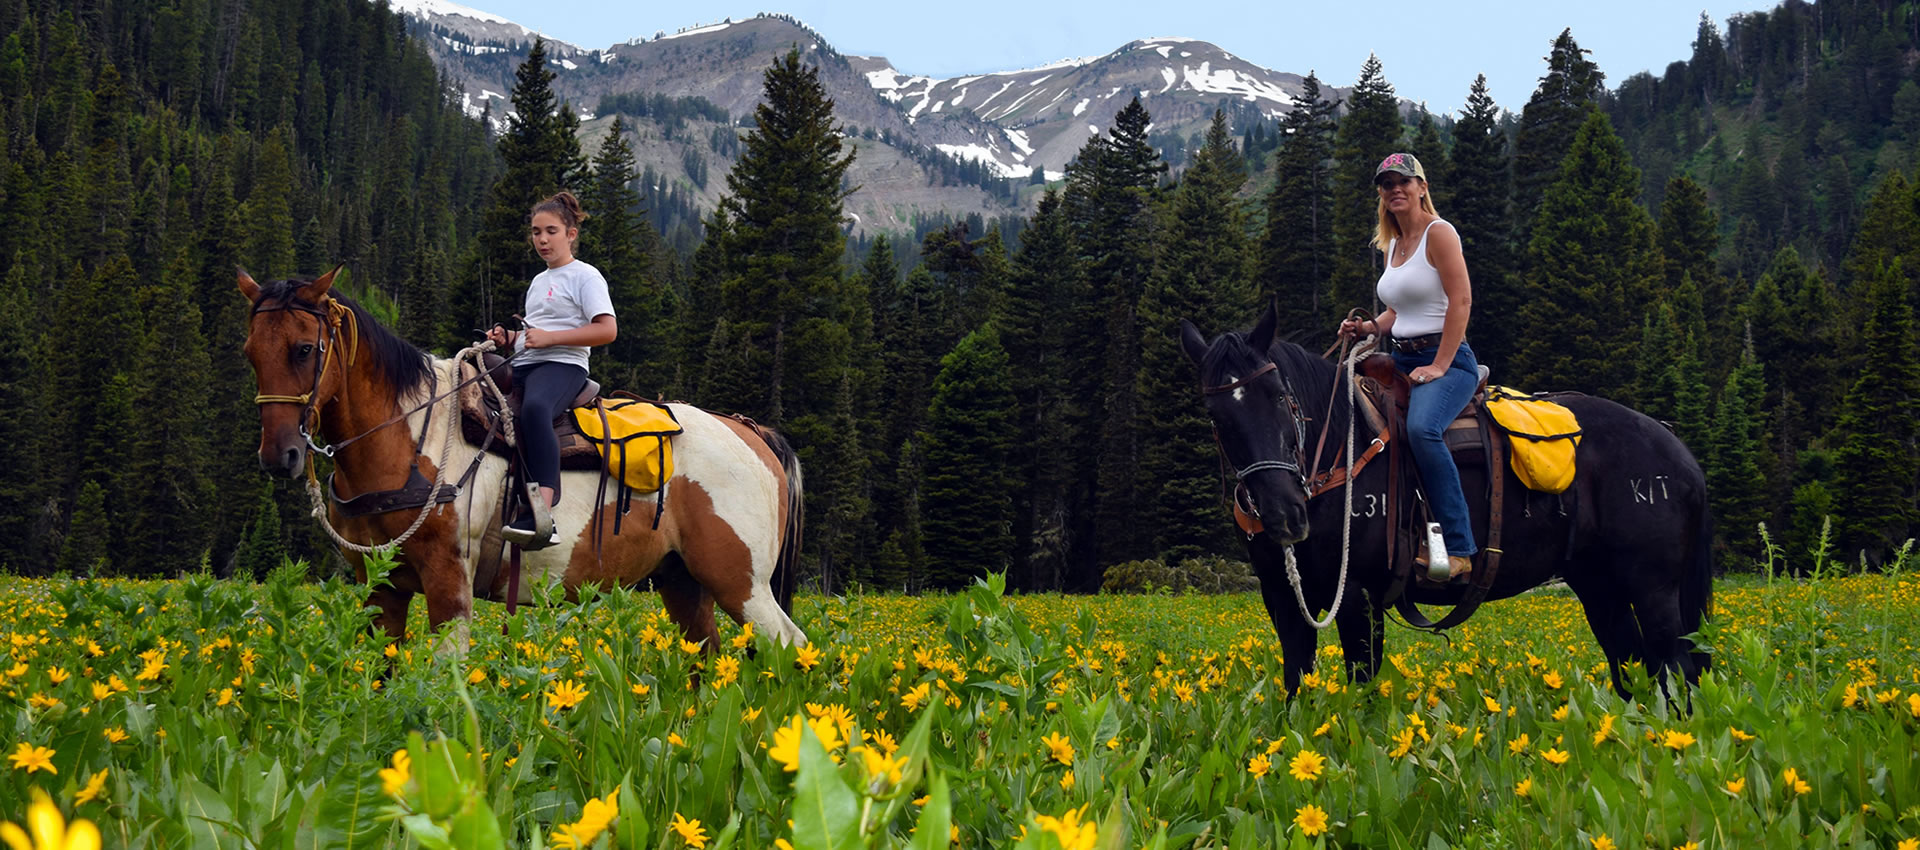 Jackson Hole Trail Rides, Horseback Rides, Wyoming, Camping